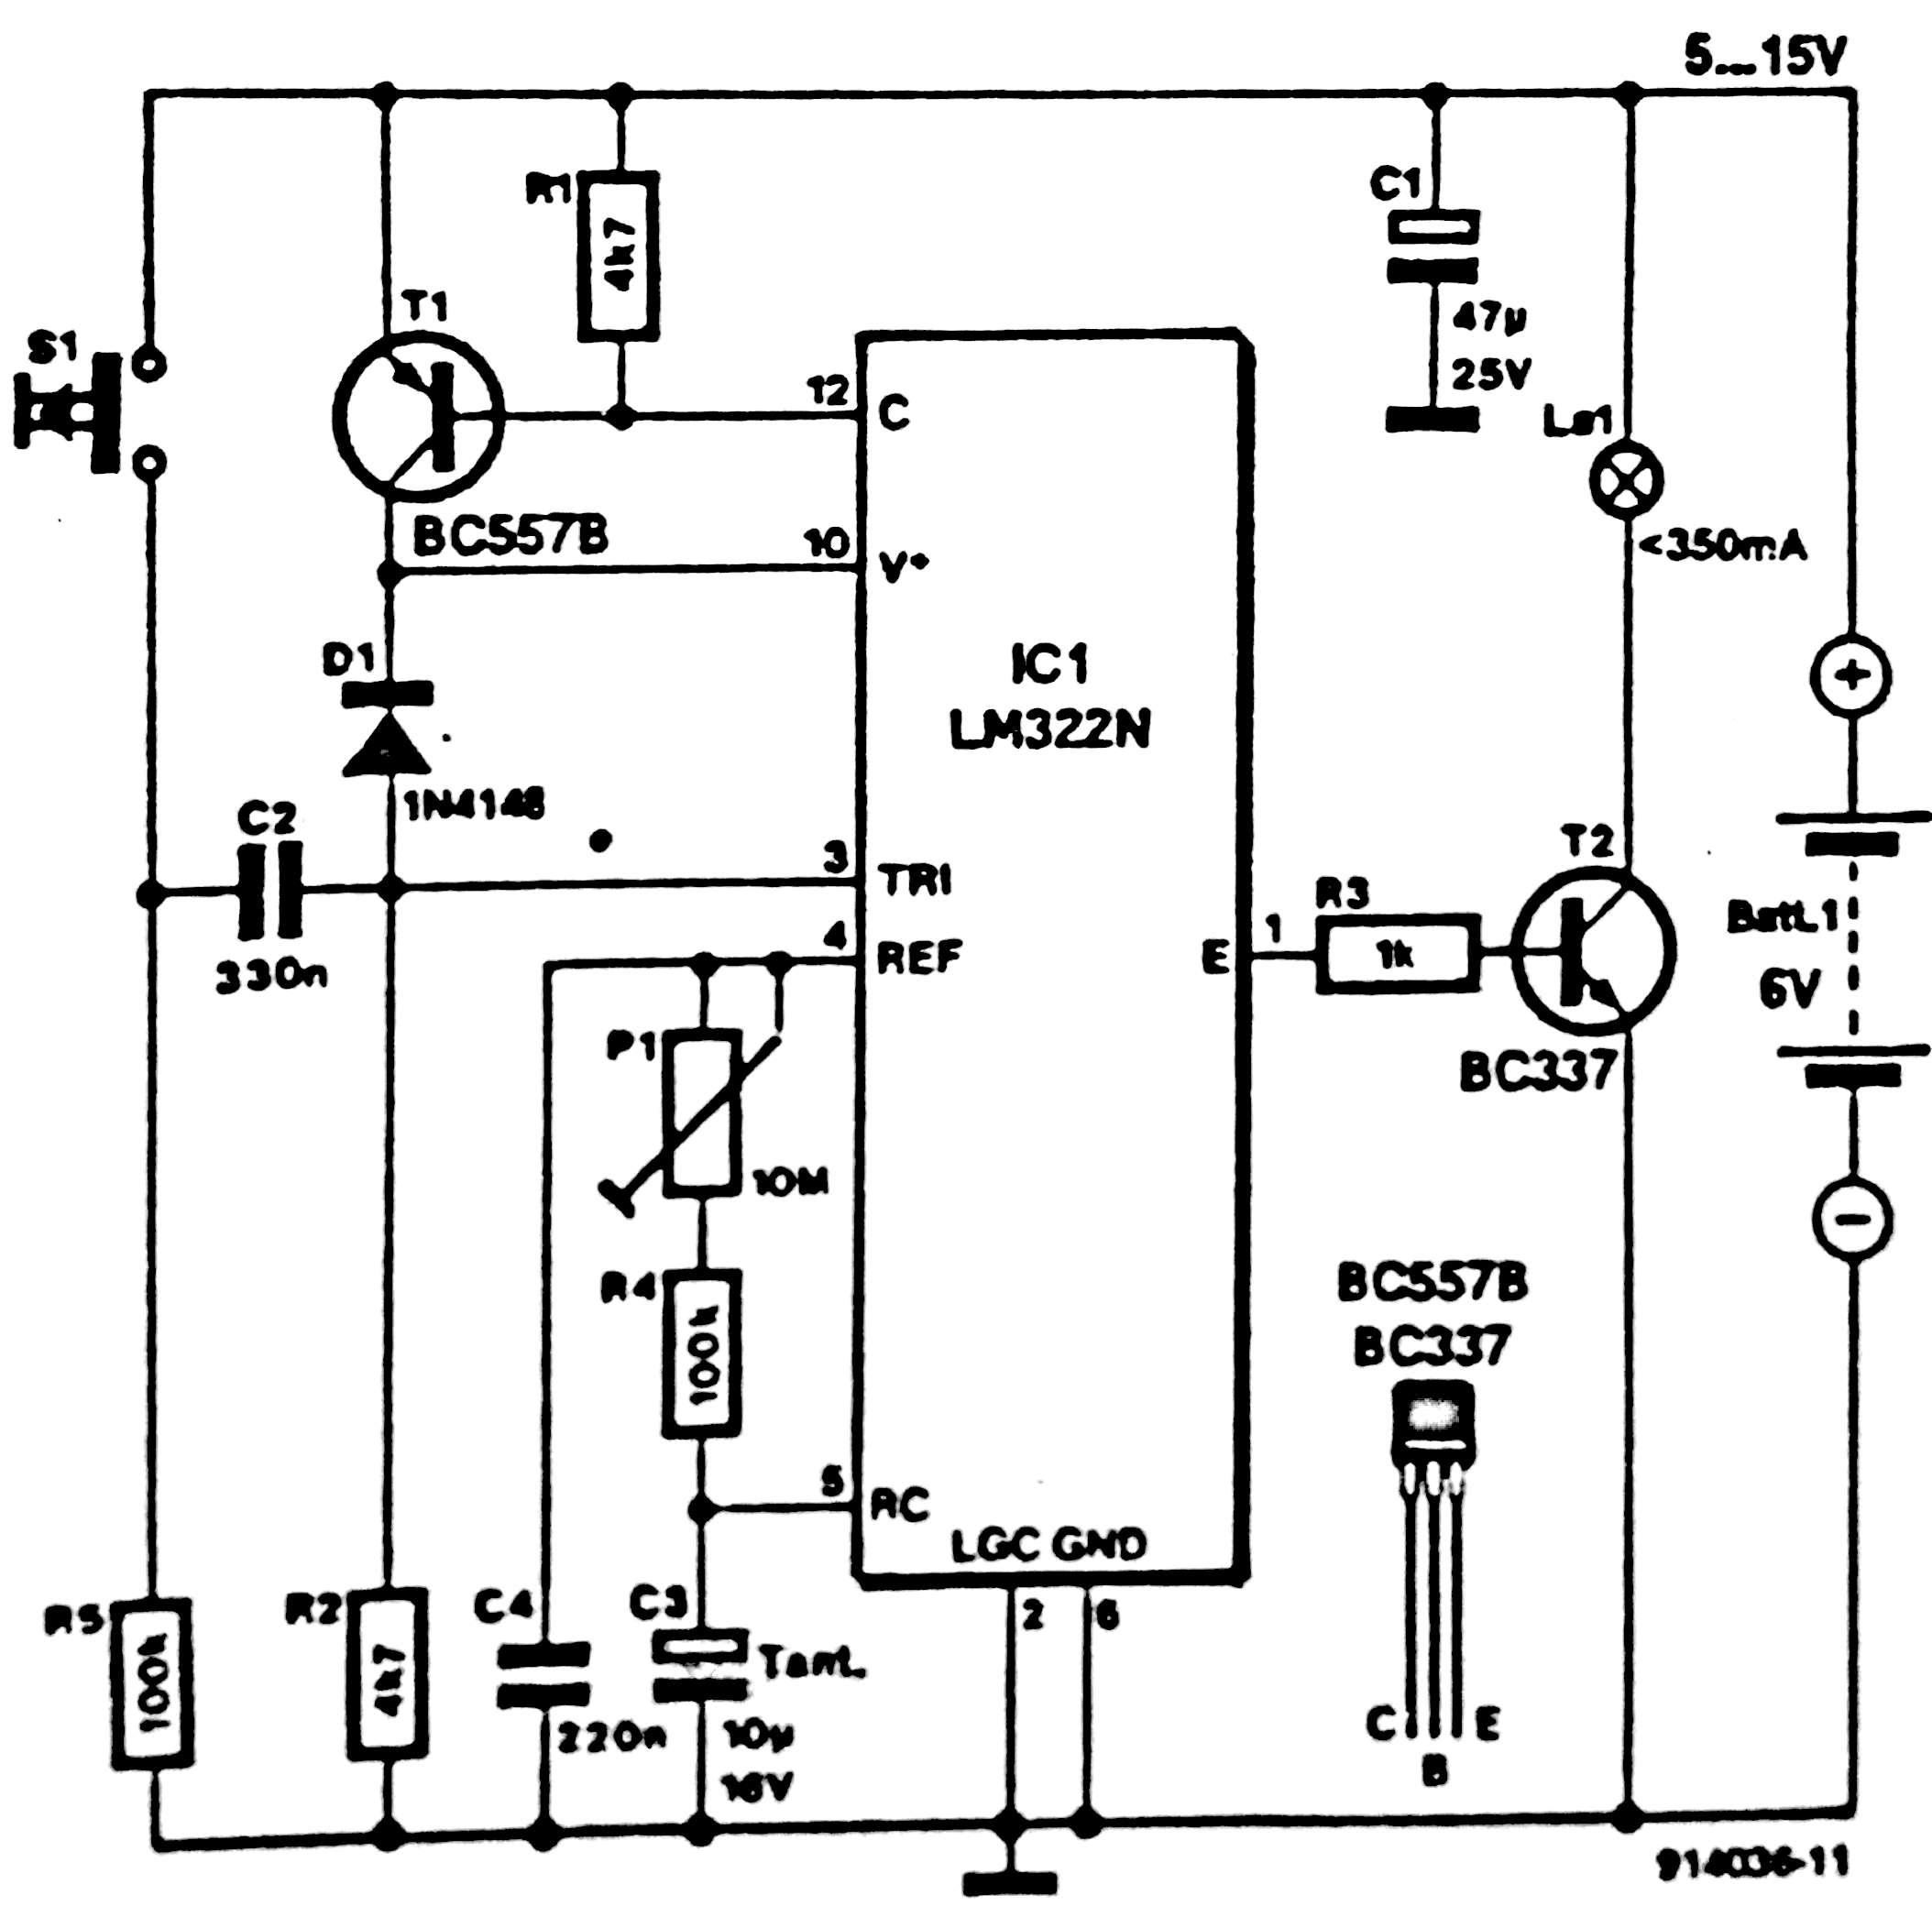 C2 Wiring SchematicWiringWiring Diagram Images Database – Diagram Schematic Transmission 2 Engine94